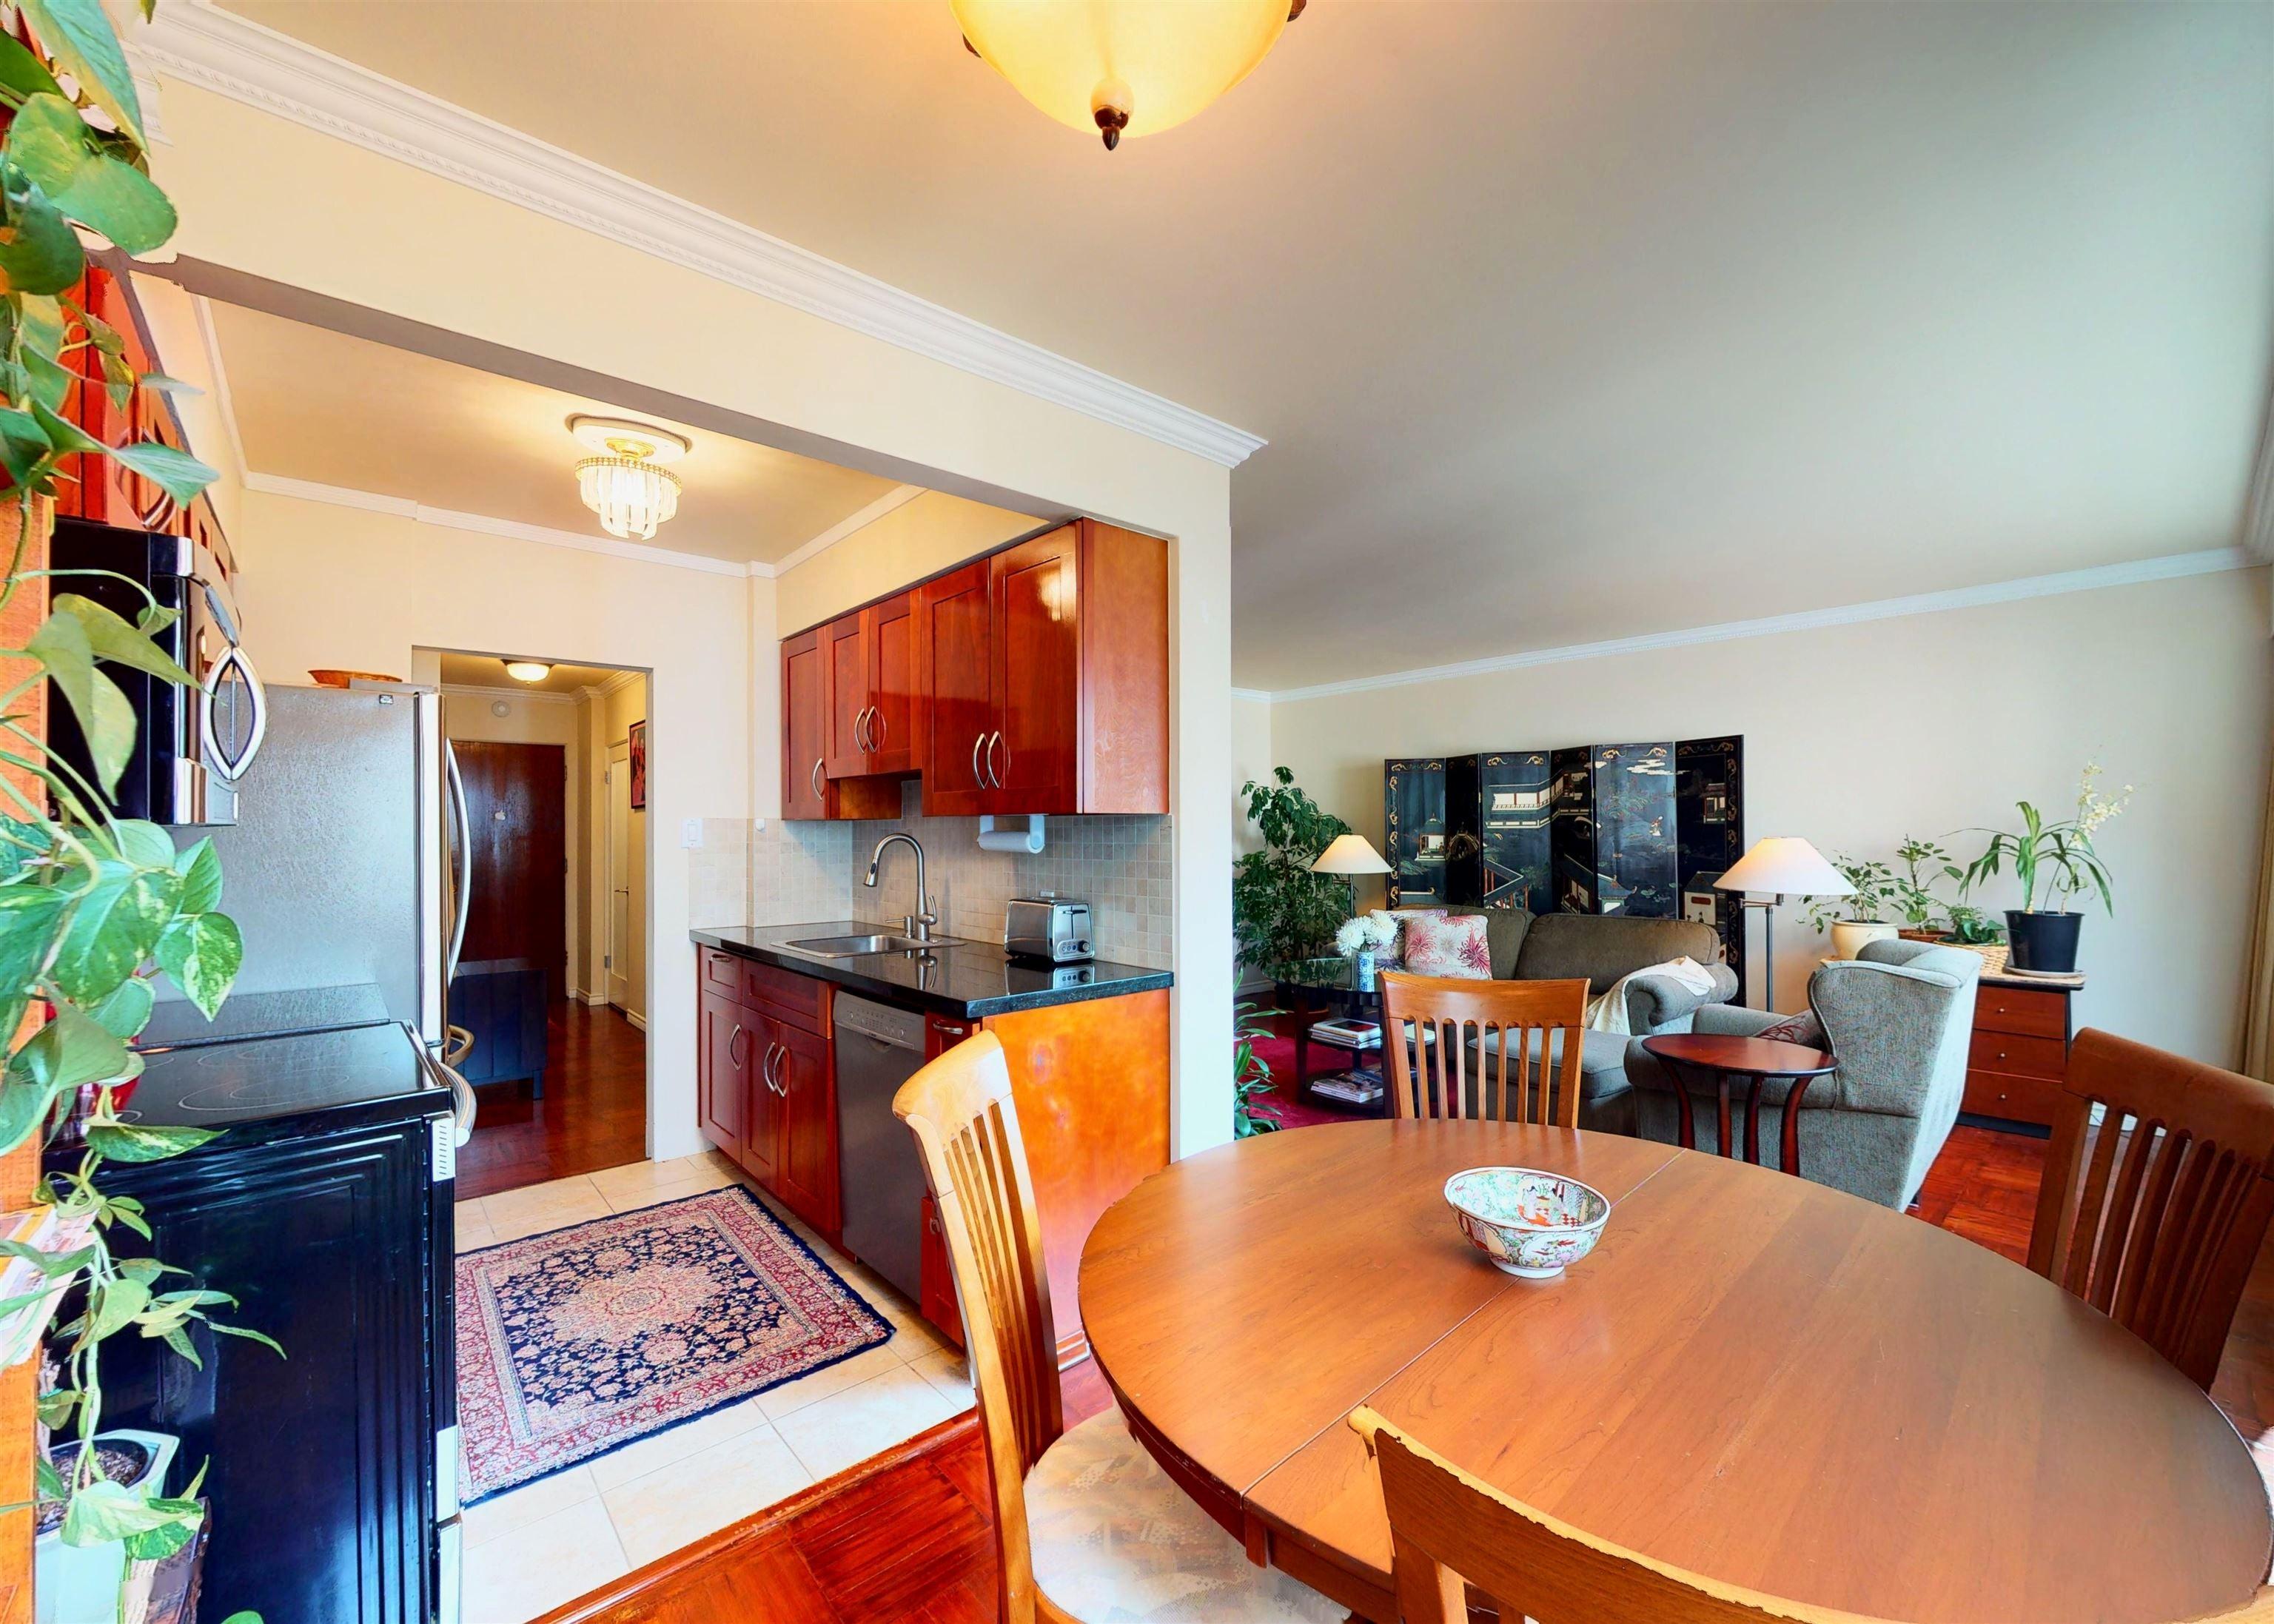 202 1750 ESQUIMALT AVENUE - Ambleside Apartment/Condo for sale, 1 Bedroom (R2610188) - #11